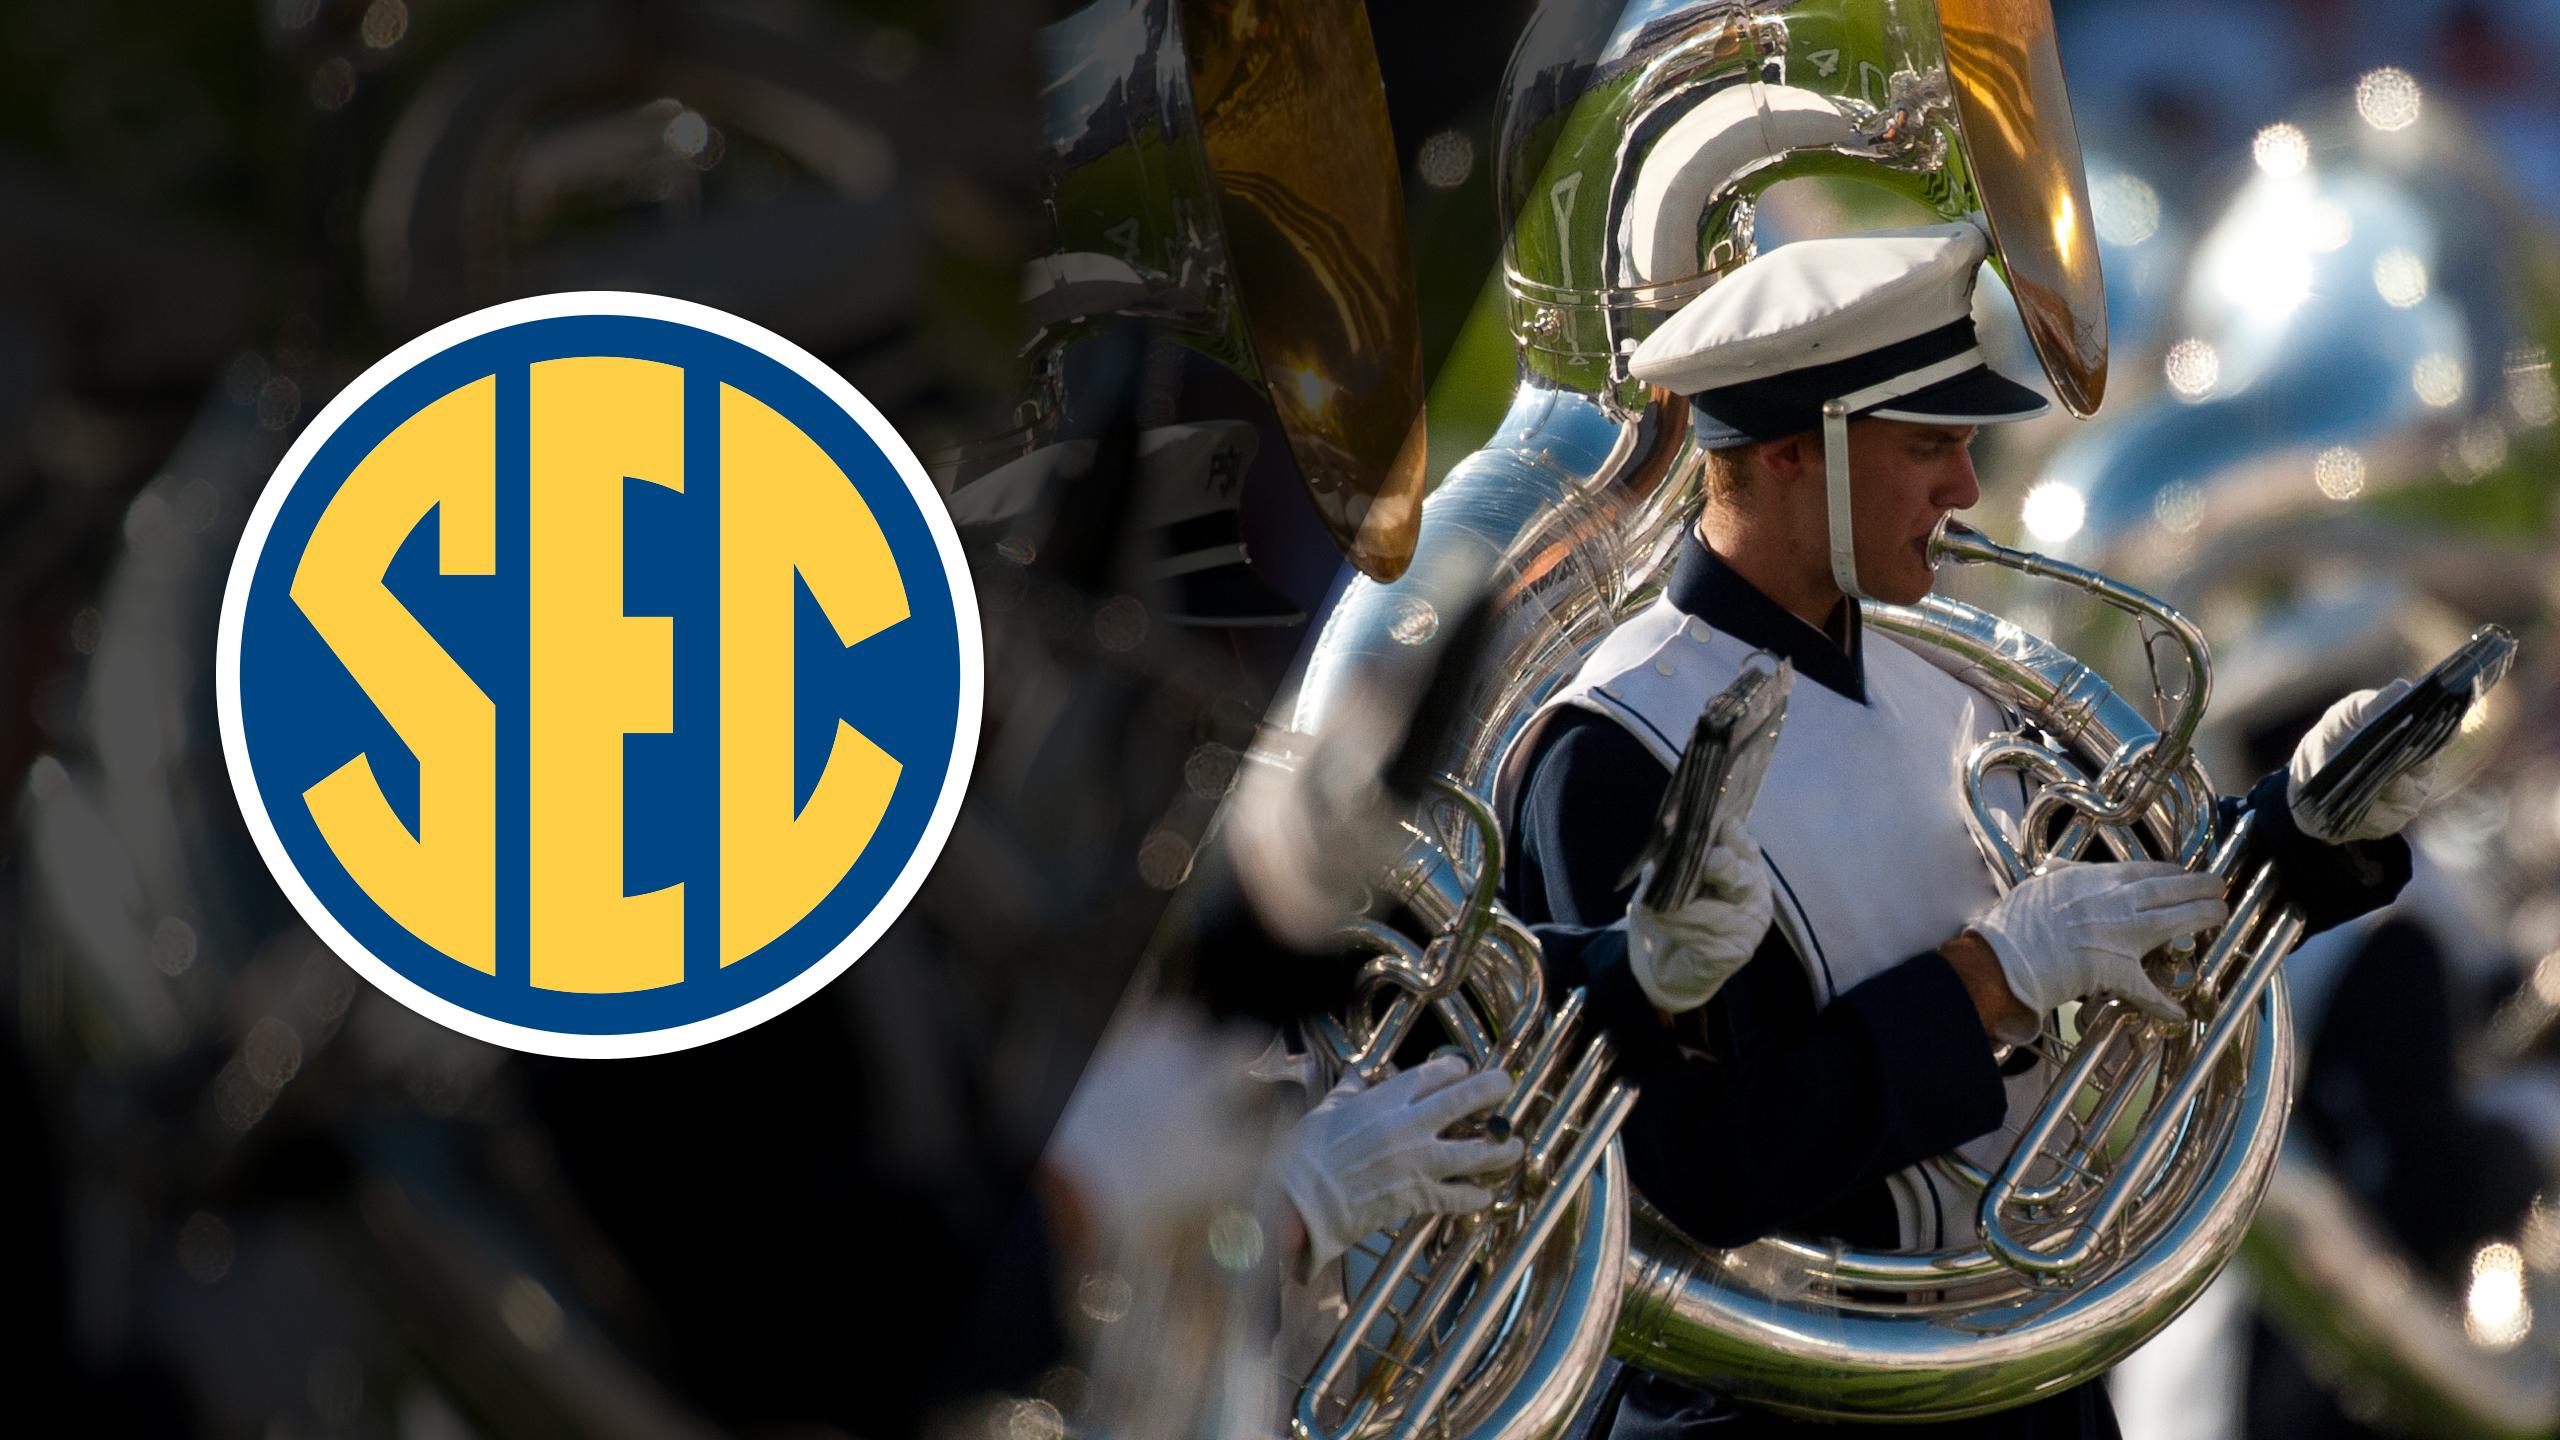 SEC Halftime Band Performances at Mississippi State